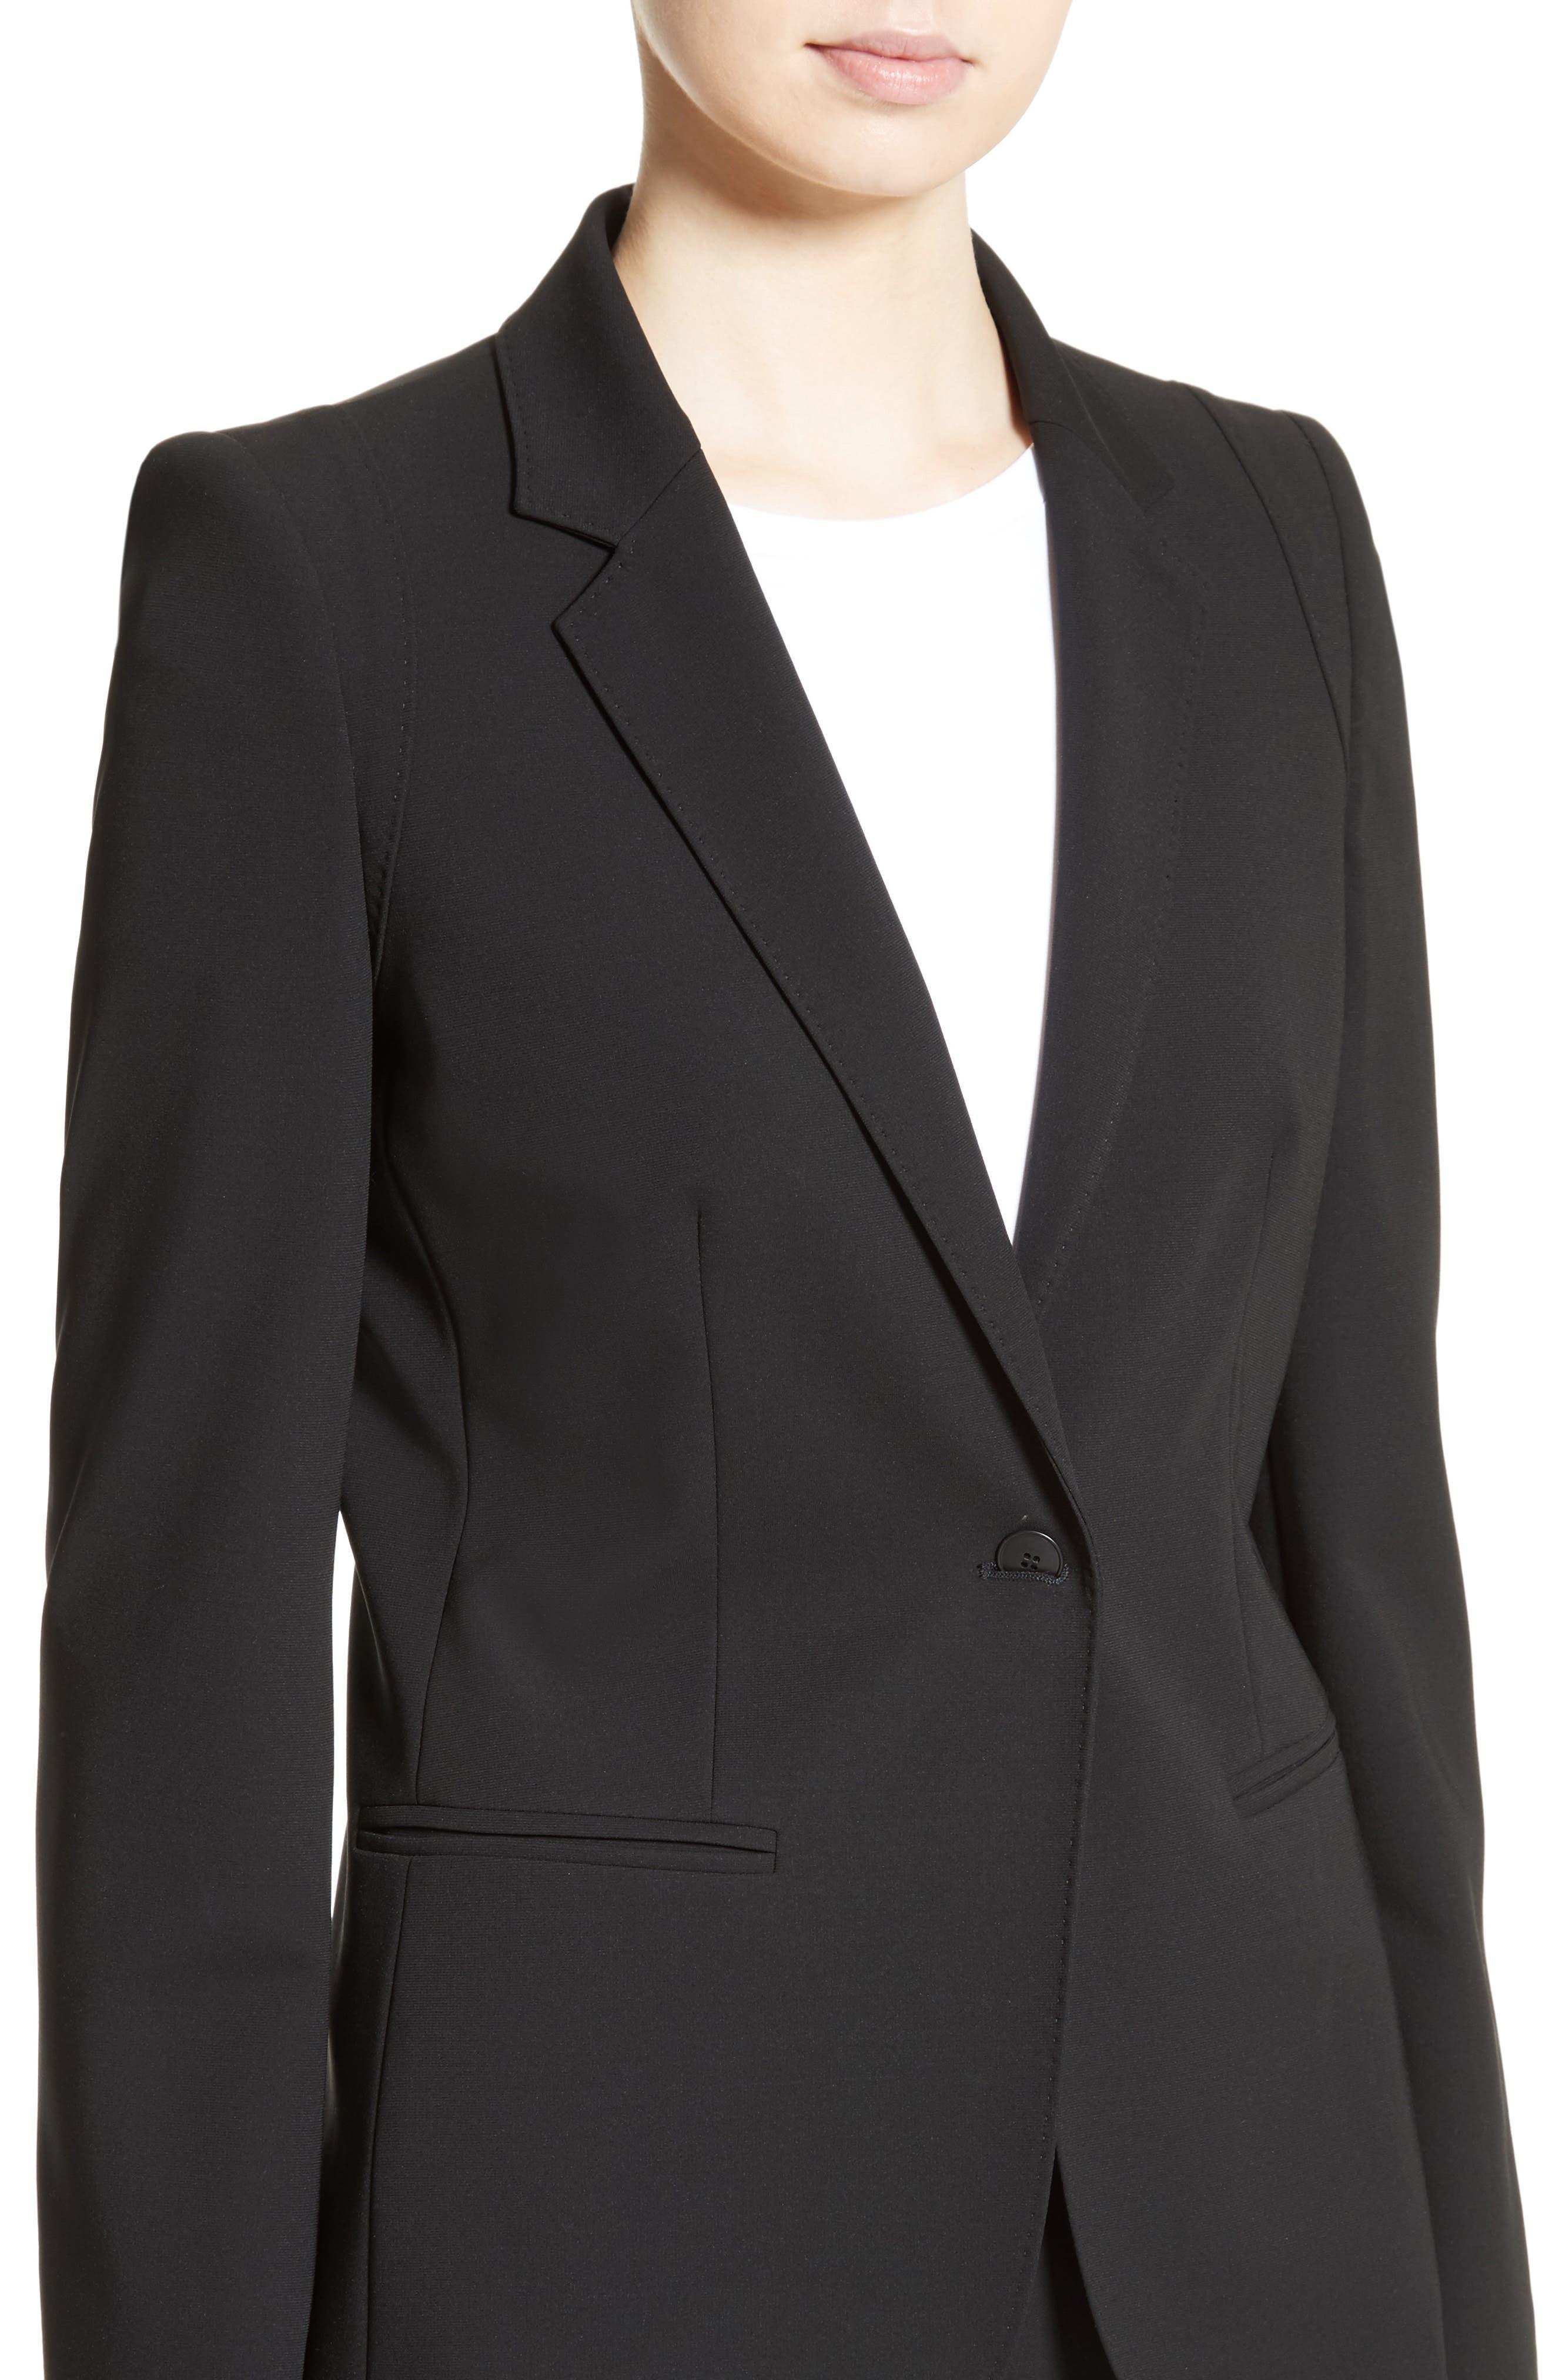 Bari Stretch Jersey Jacket,                             Alternate thumbnail 4, color,                             001